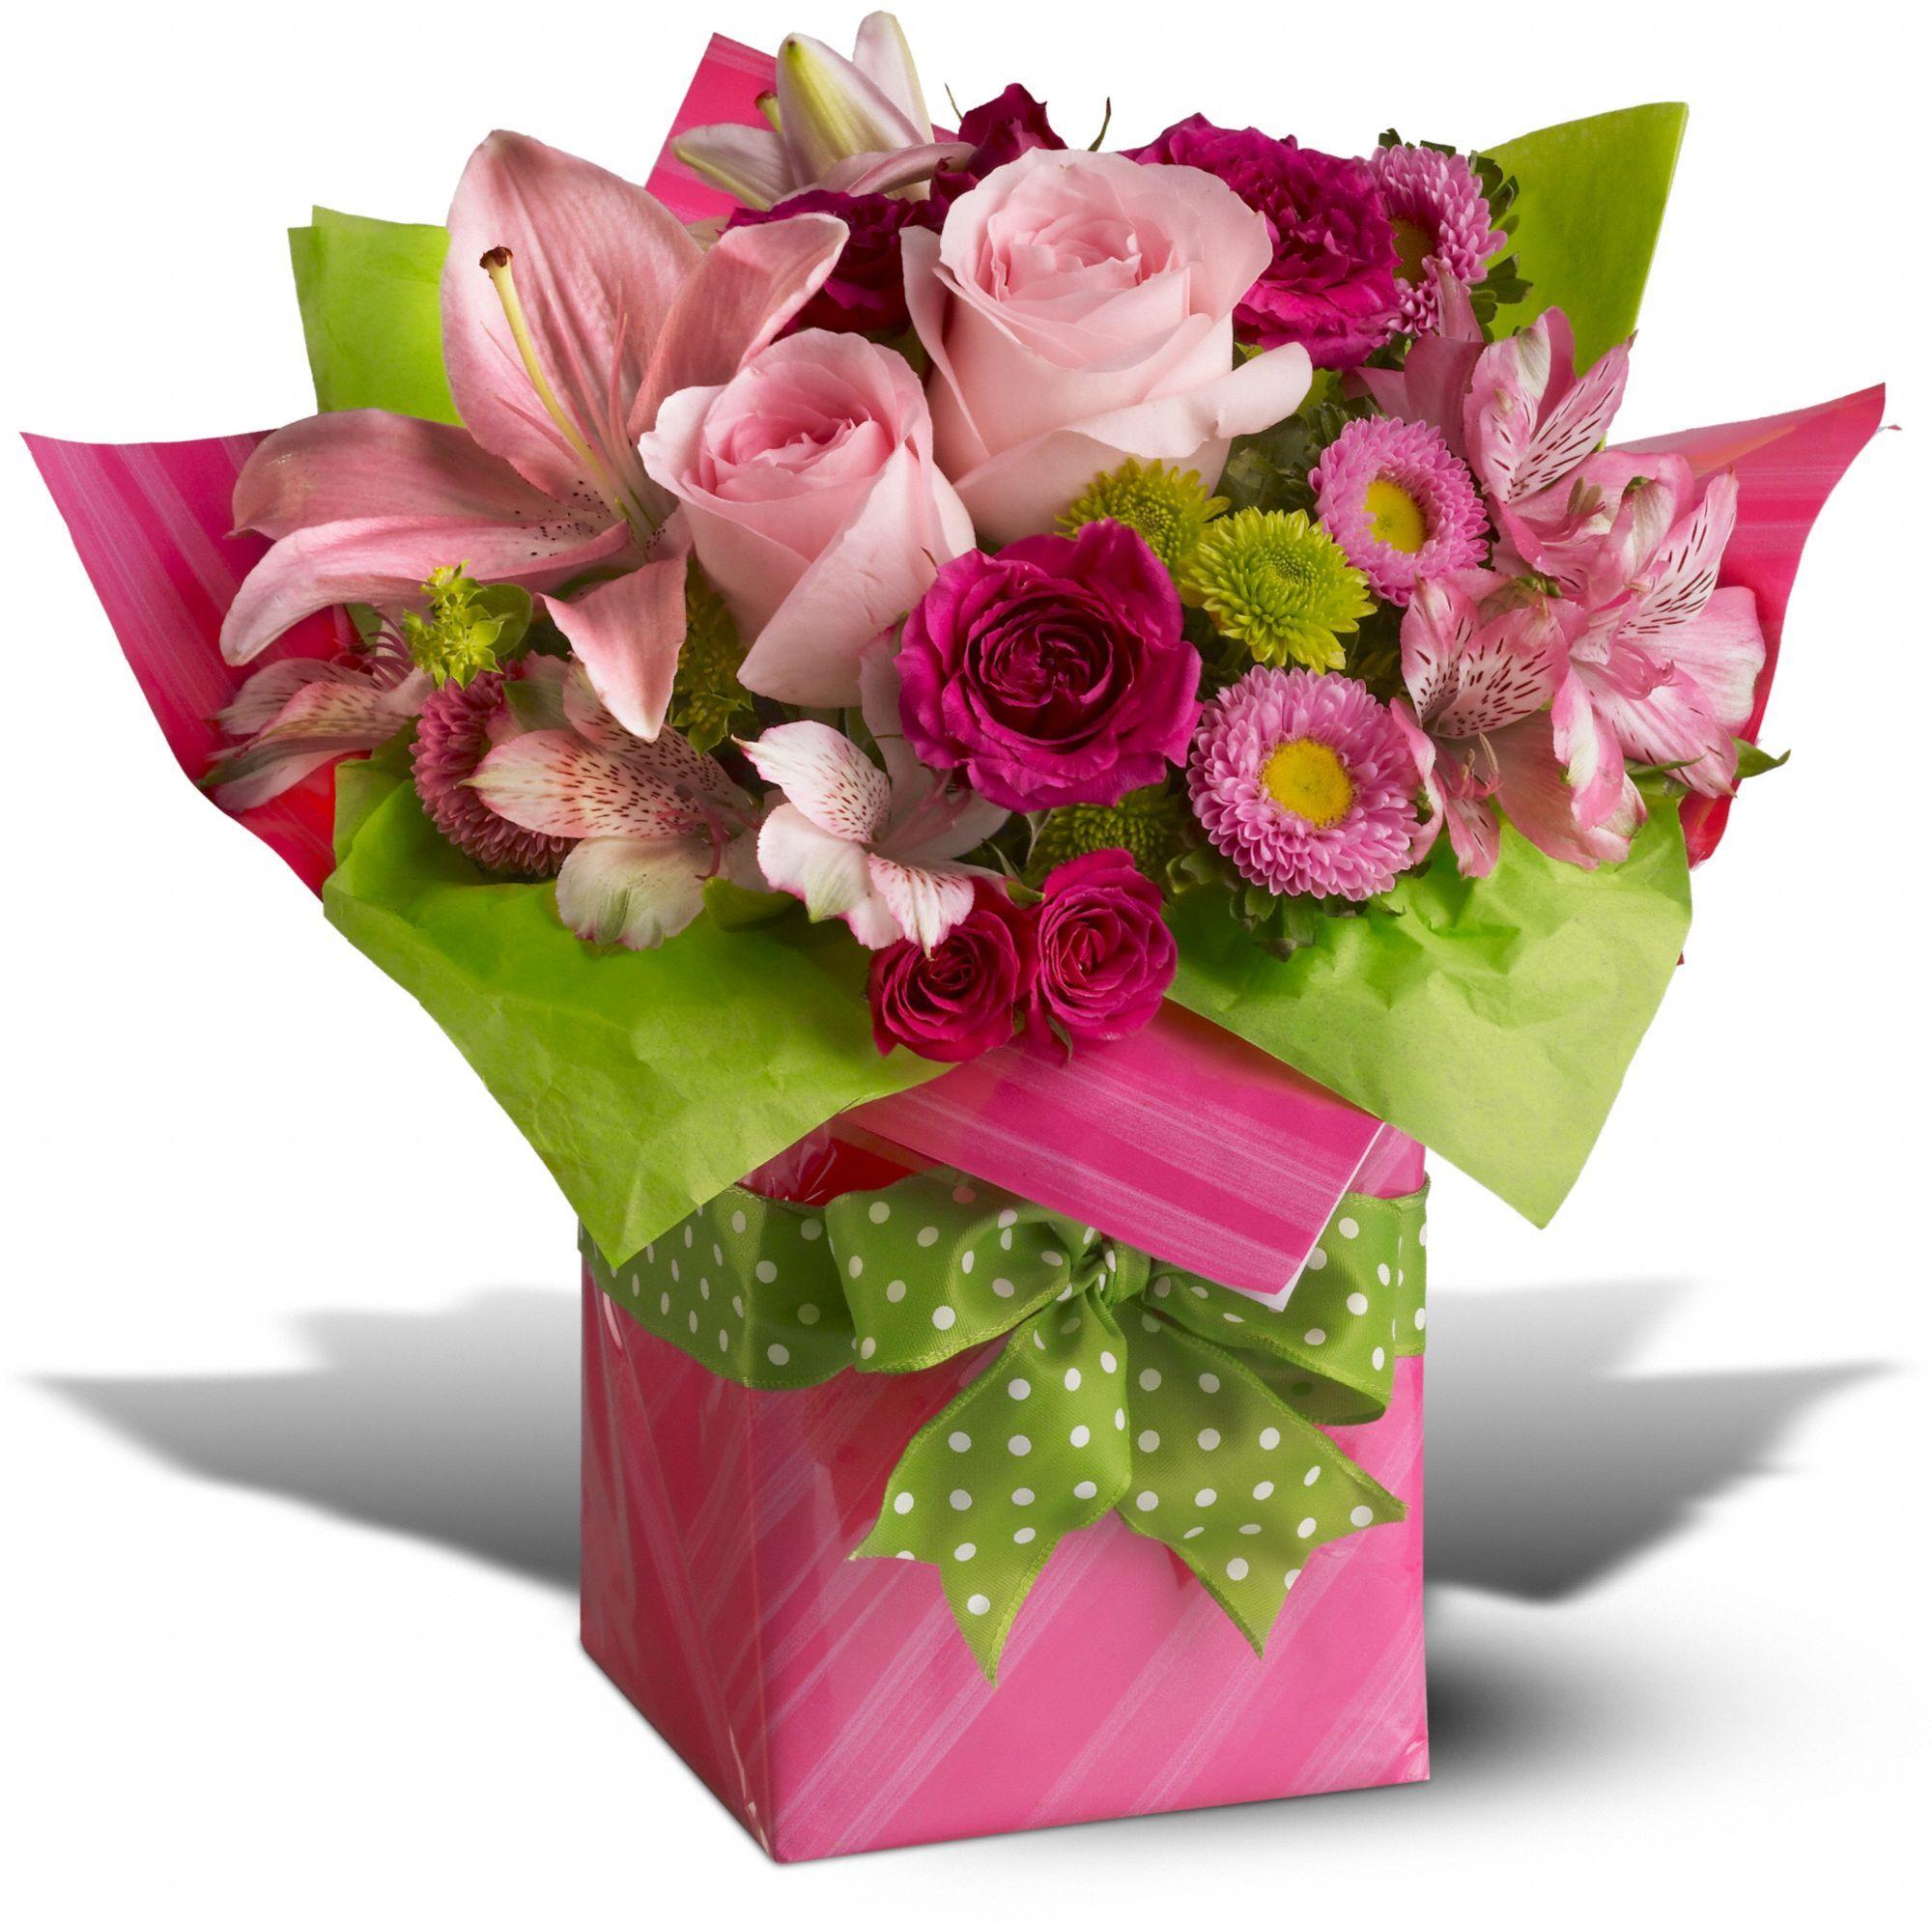 Pin By Lana Stoyanova On Flowers Graduation Flowers Birthday Flowers Flower Delivery